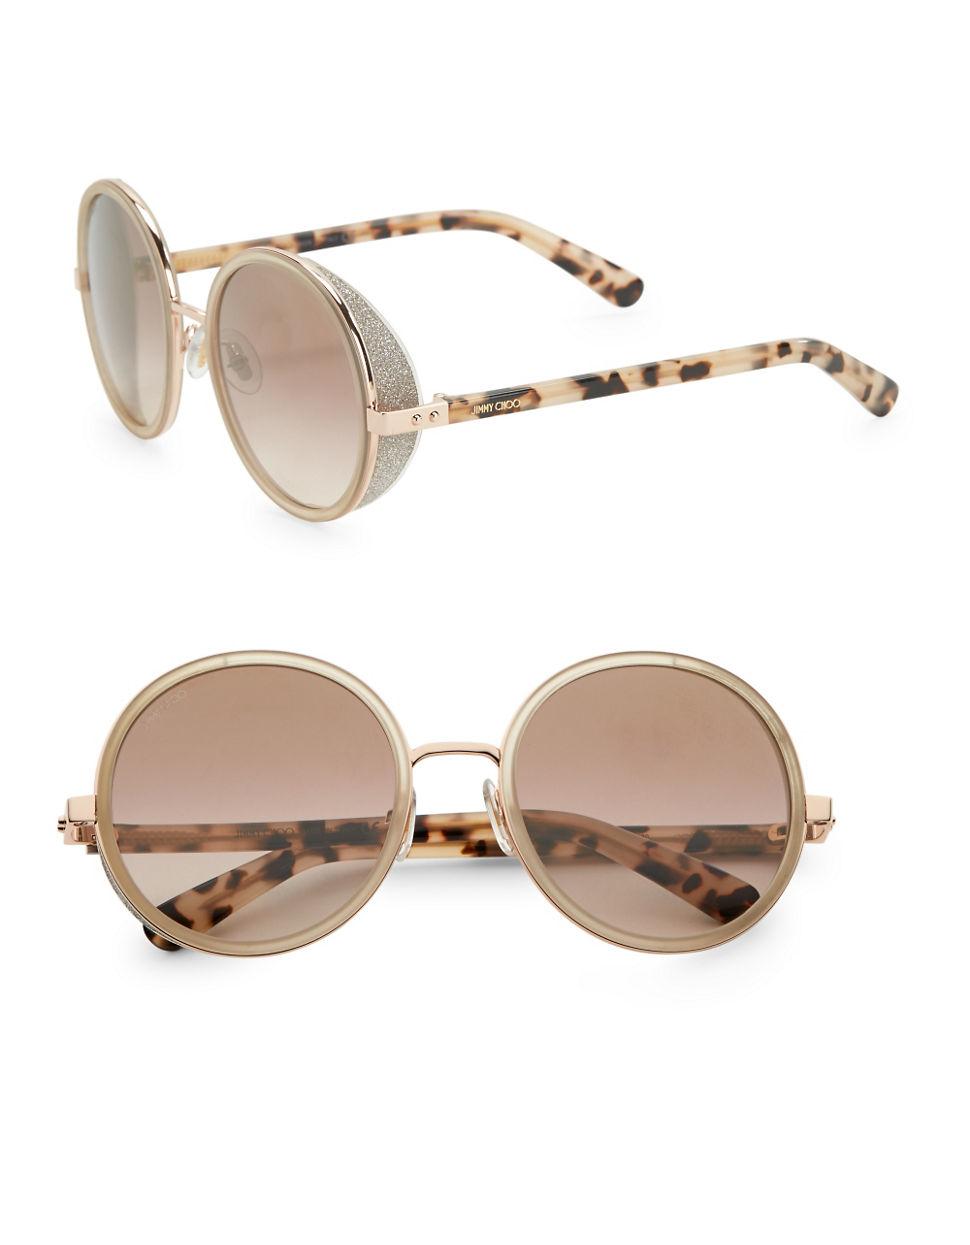 c16a4ecc9b8 Jimmy Choo Andie Round Sunglasses « Heritage Malta